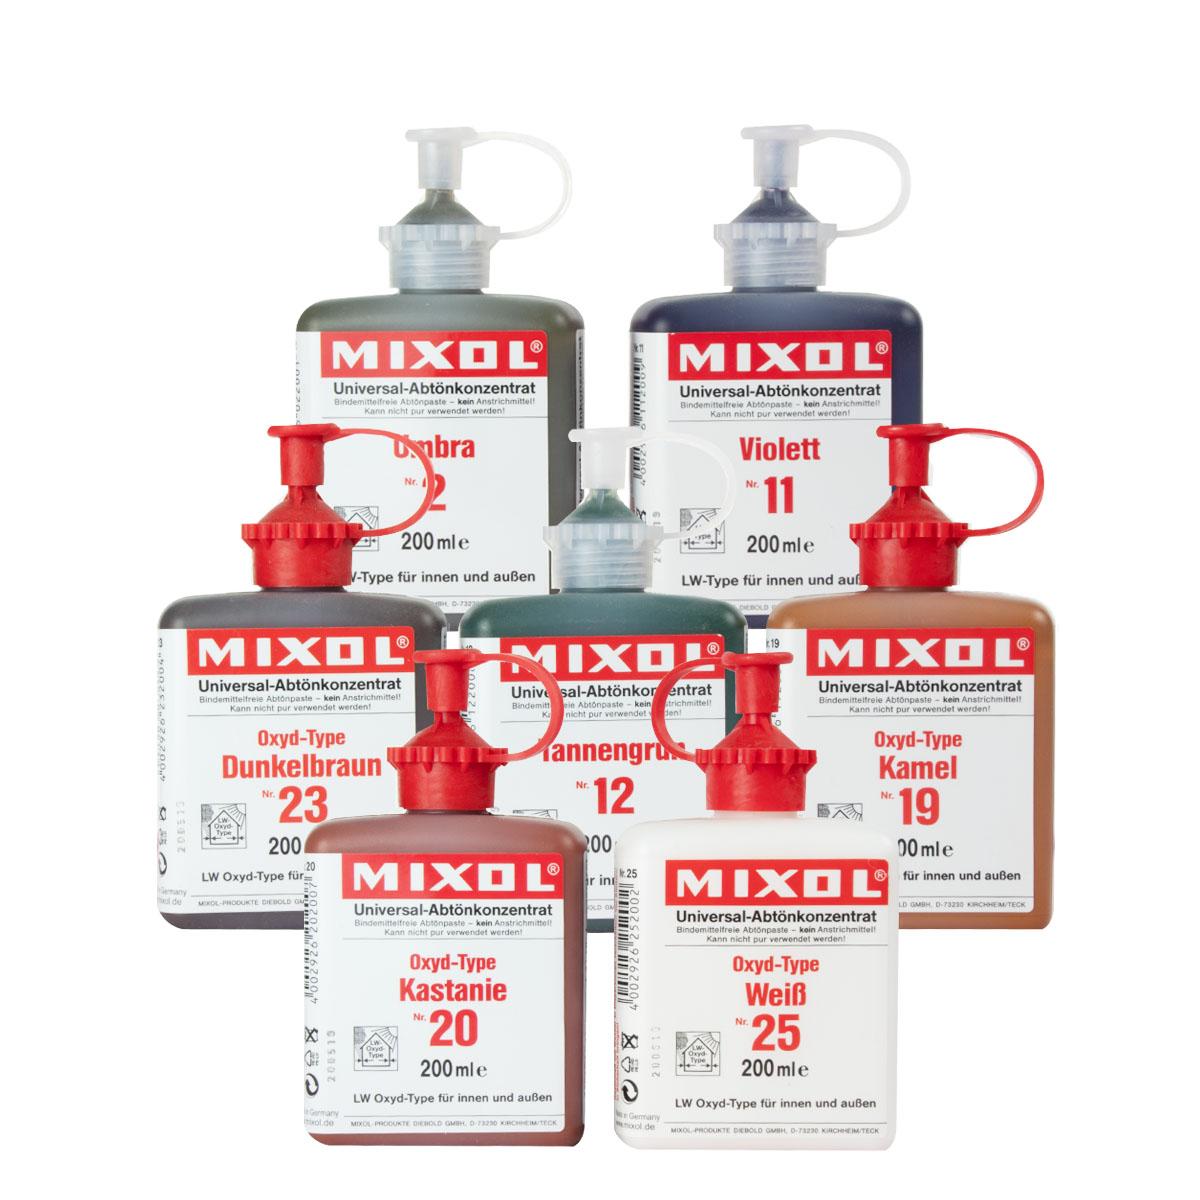 Mixol Universal Abtönkonzentrat 200ml Nr 21 Oxyd-Terrabraun